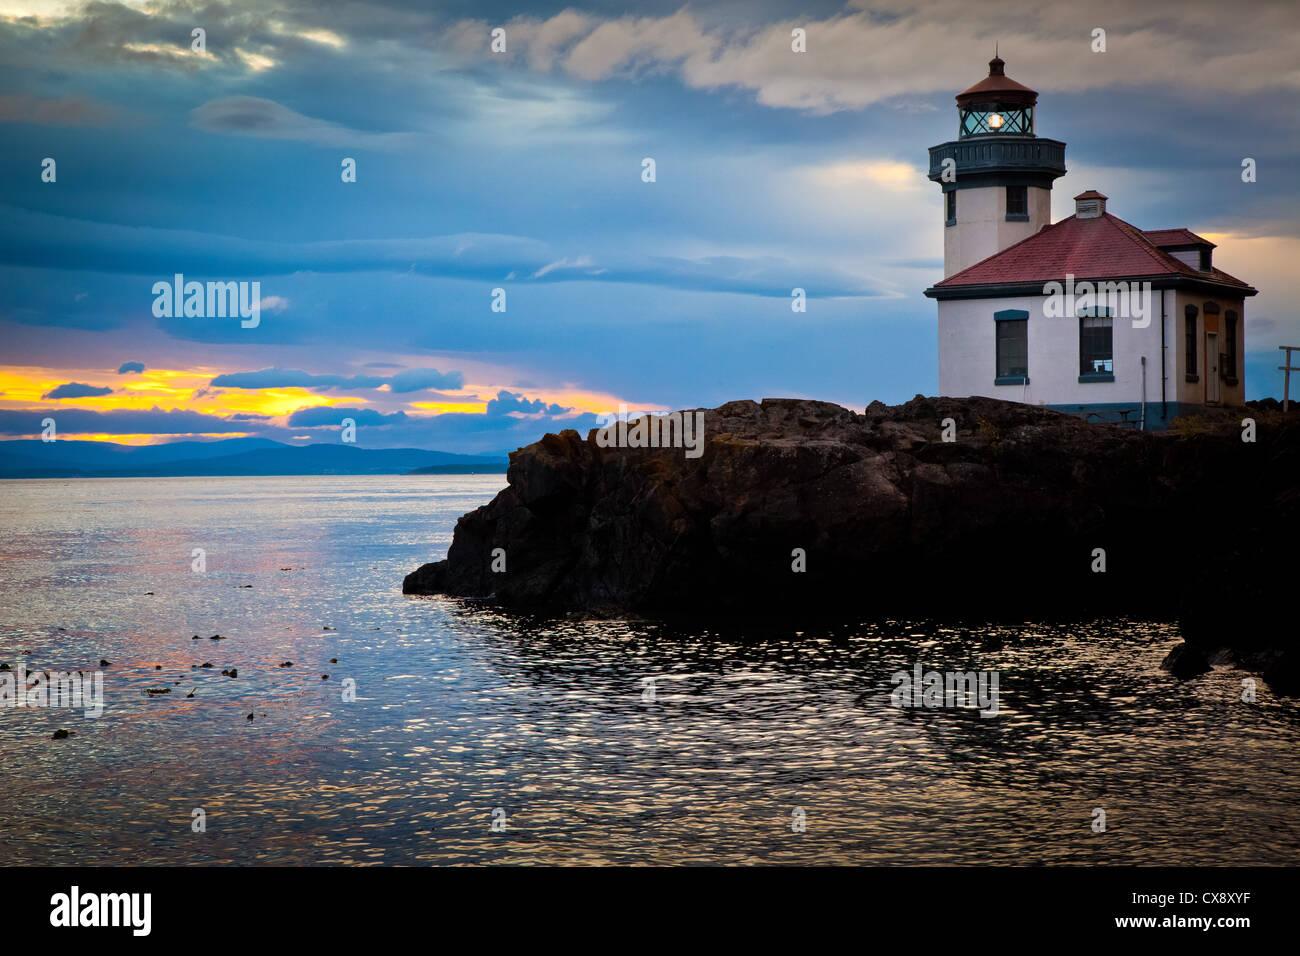 Kalk-Brennofen-Leuchtturm auf San Juan Island, Washington Stockfoto